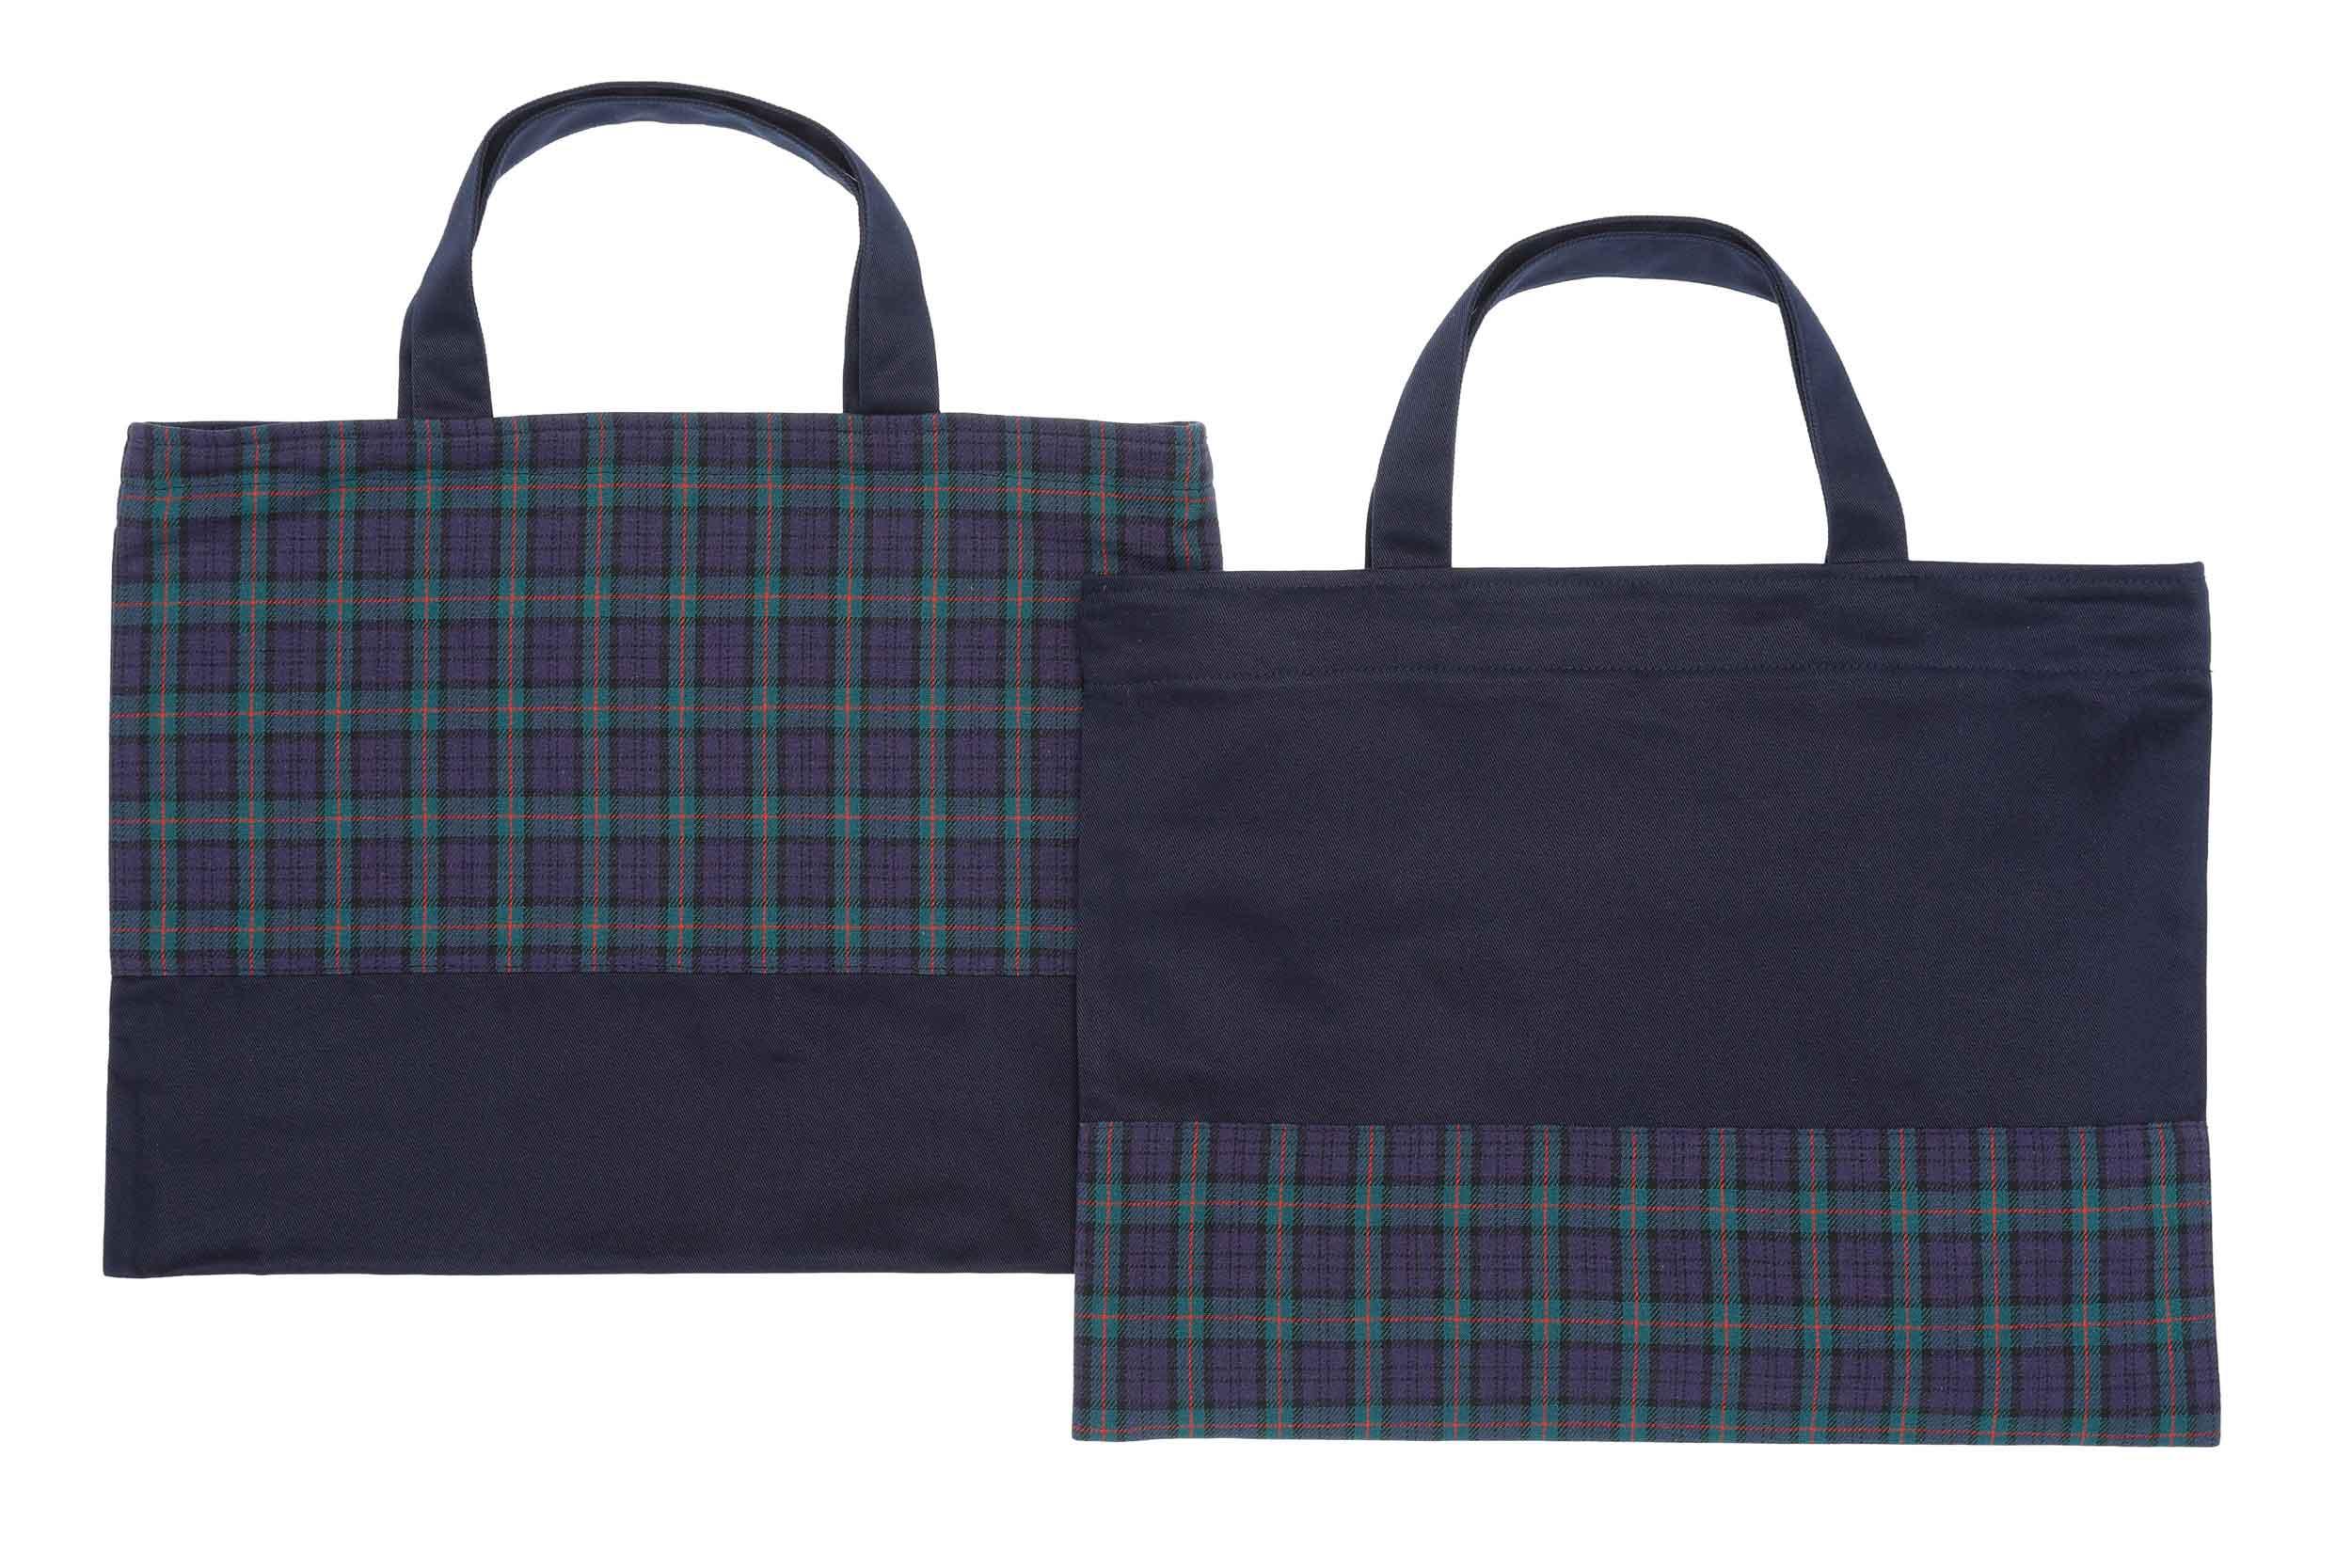 青山学院初等部の体操着袋と多目的袋